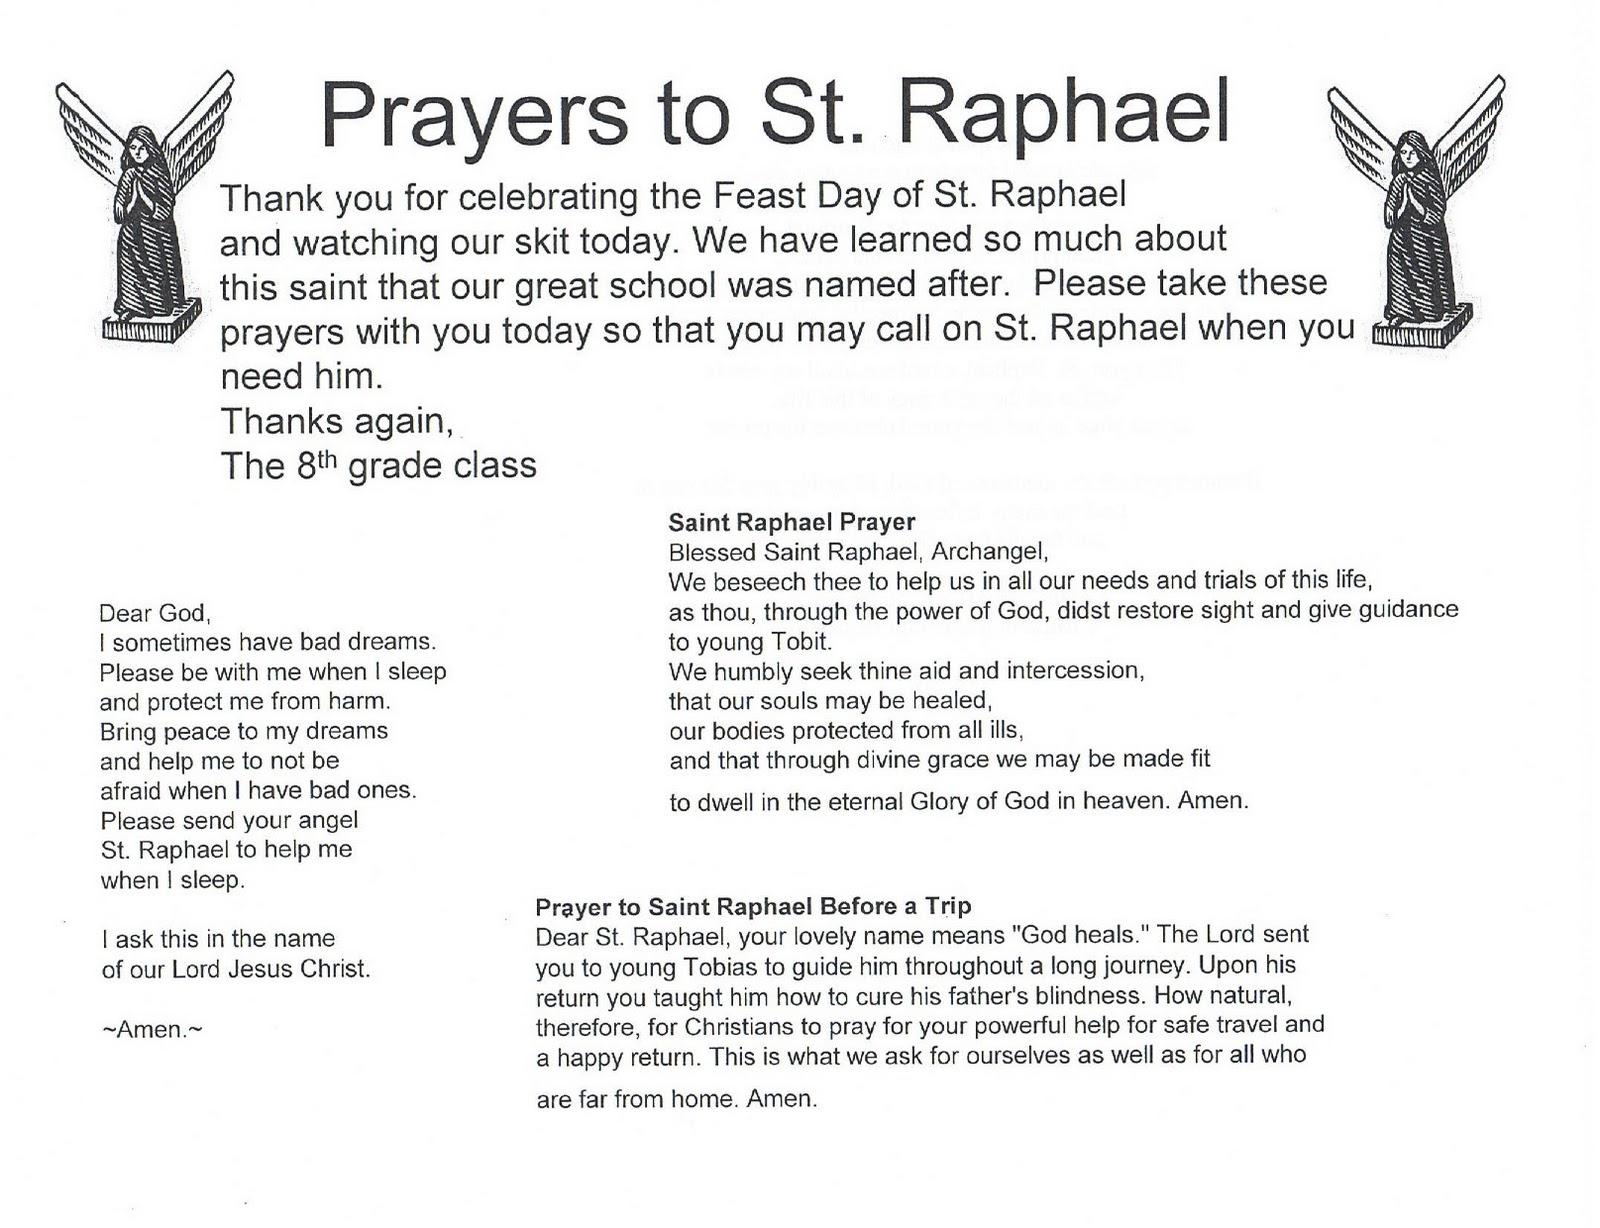 Prayer to st raphael for healing